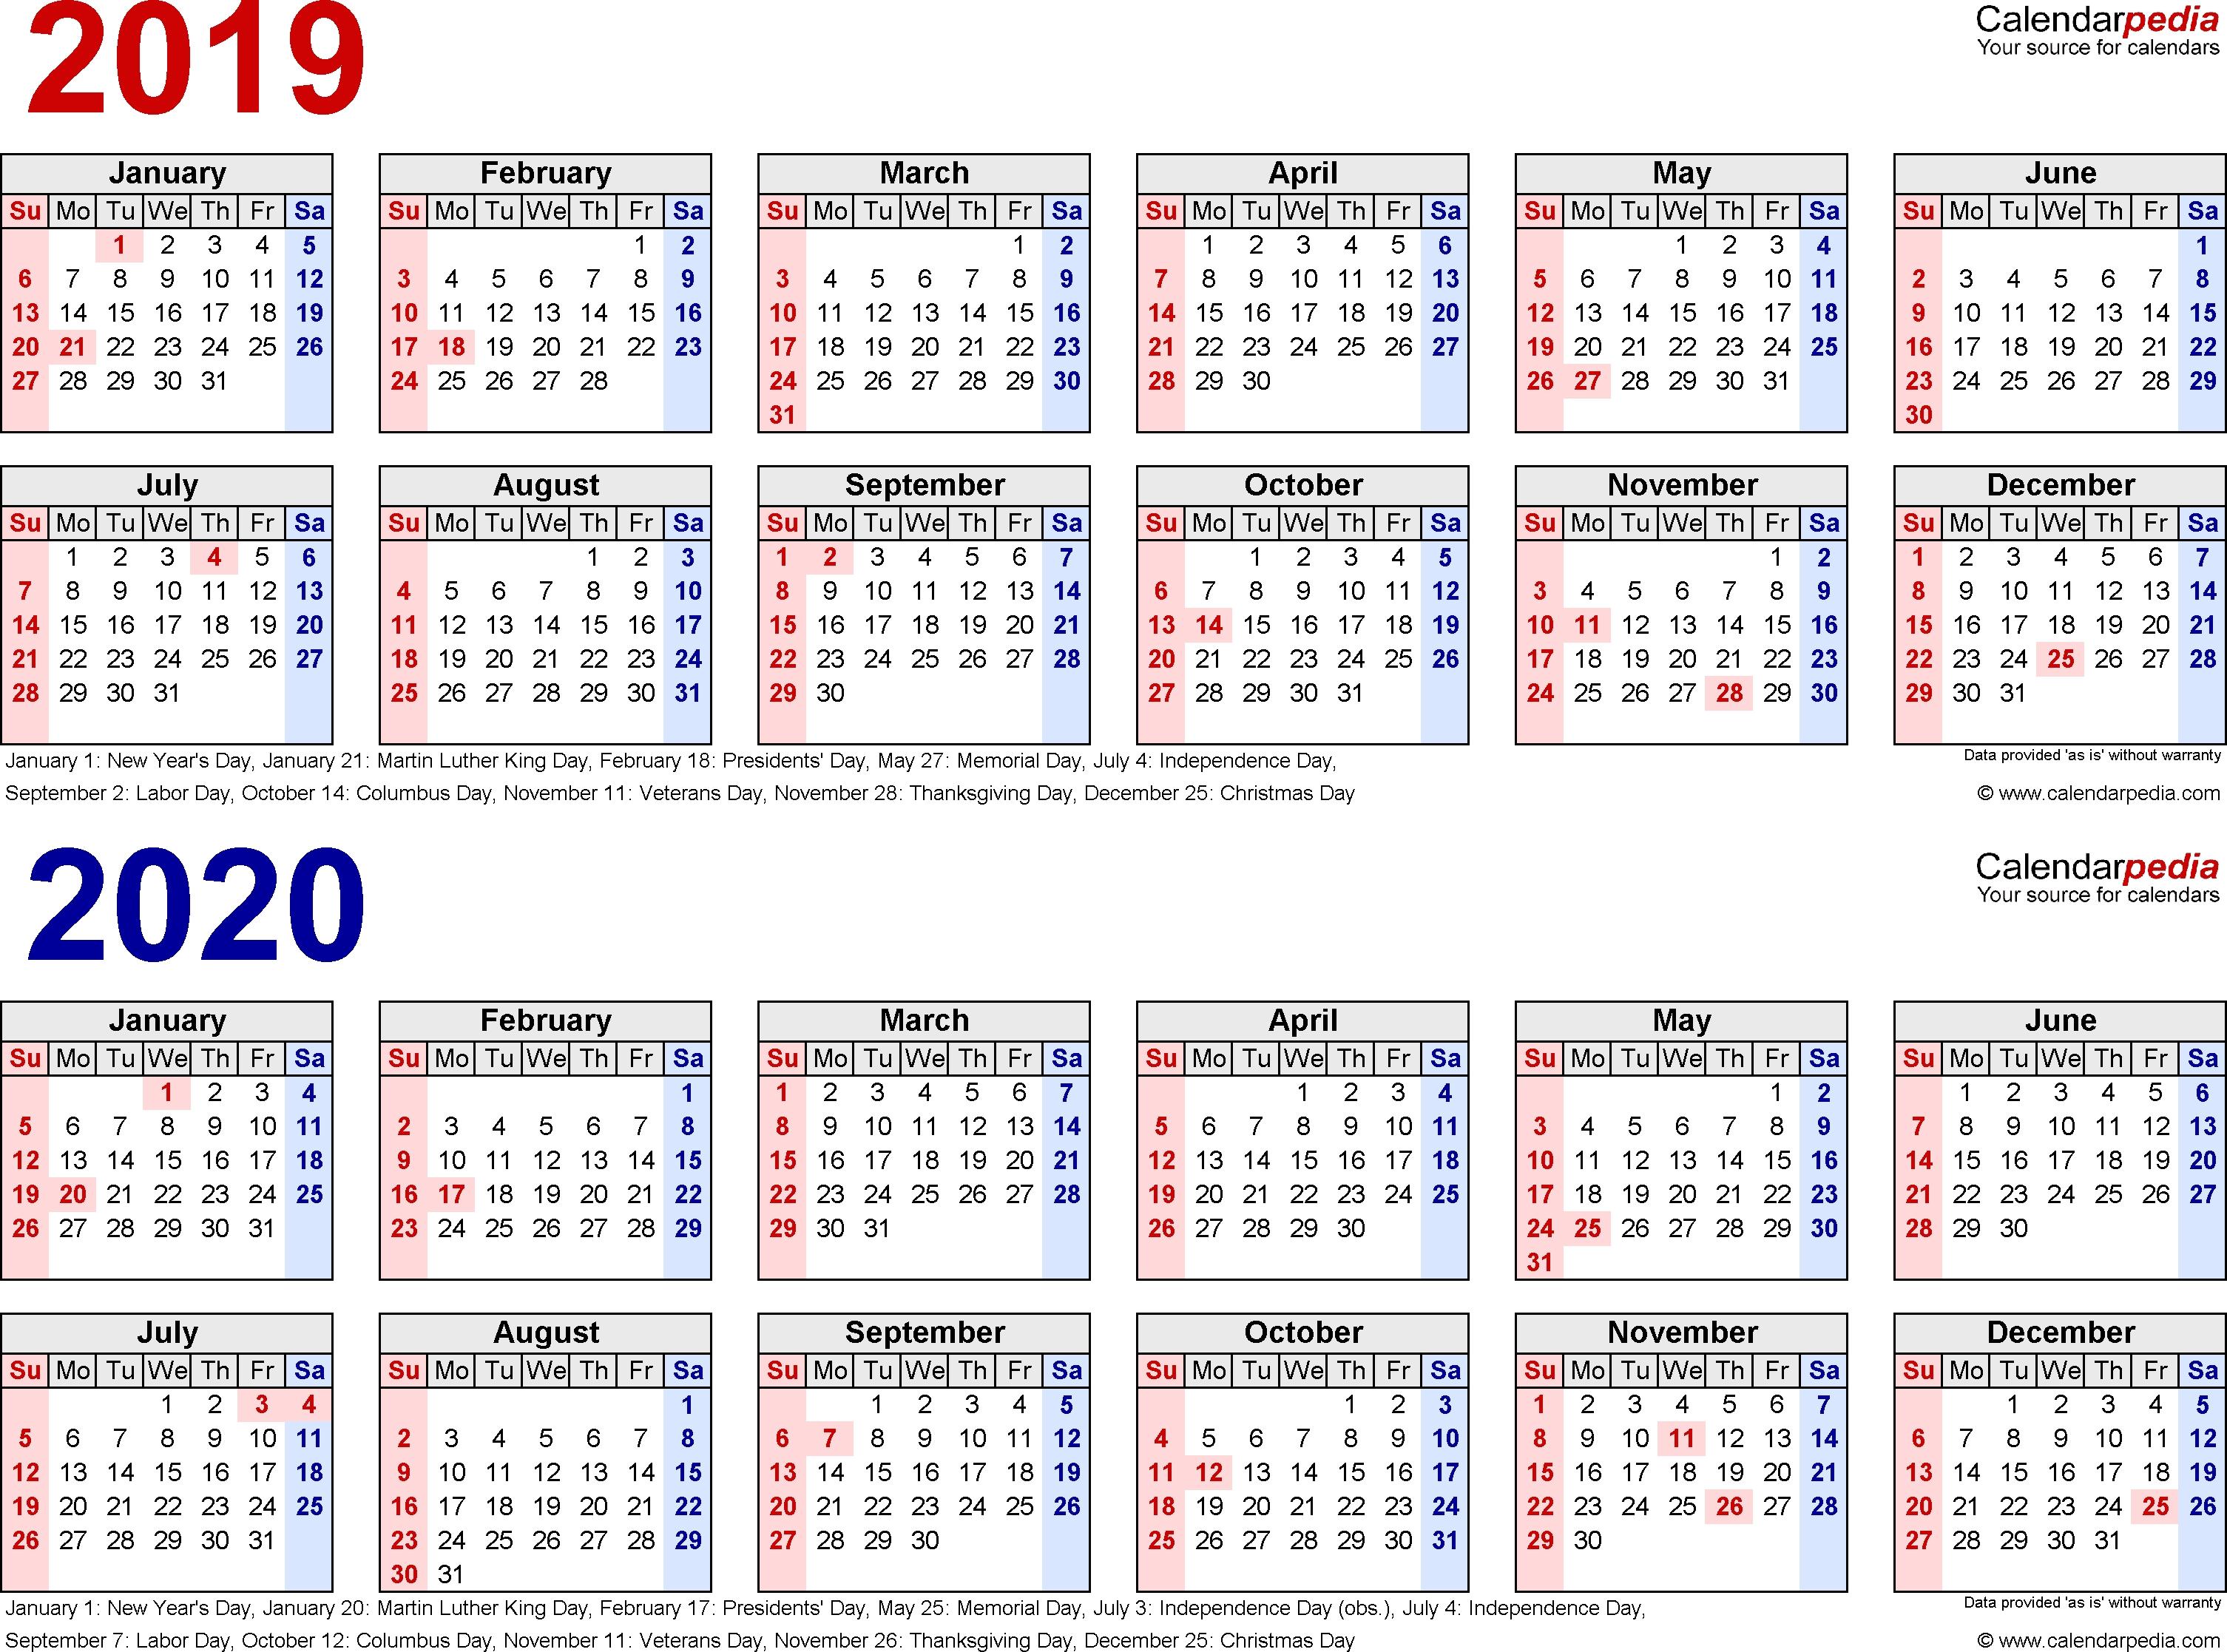 2019-2020 Calendar - Free Printable Two-Year Word Calendars with Printable Calendar 2019 2020 Write On